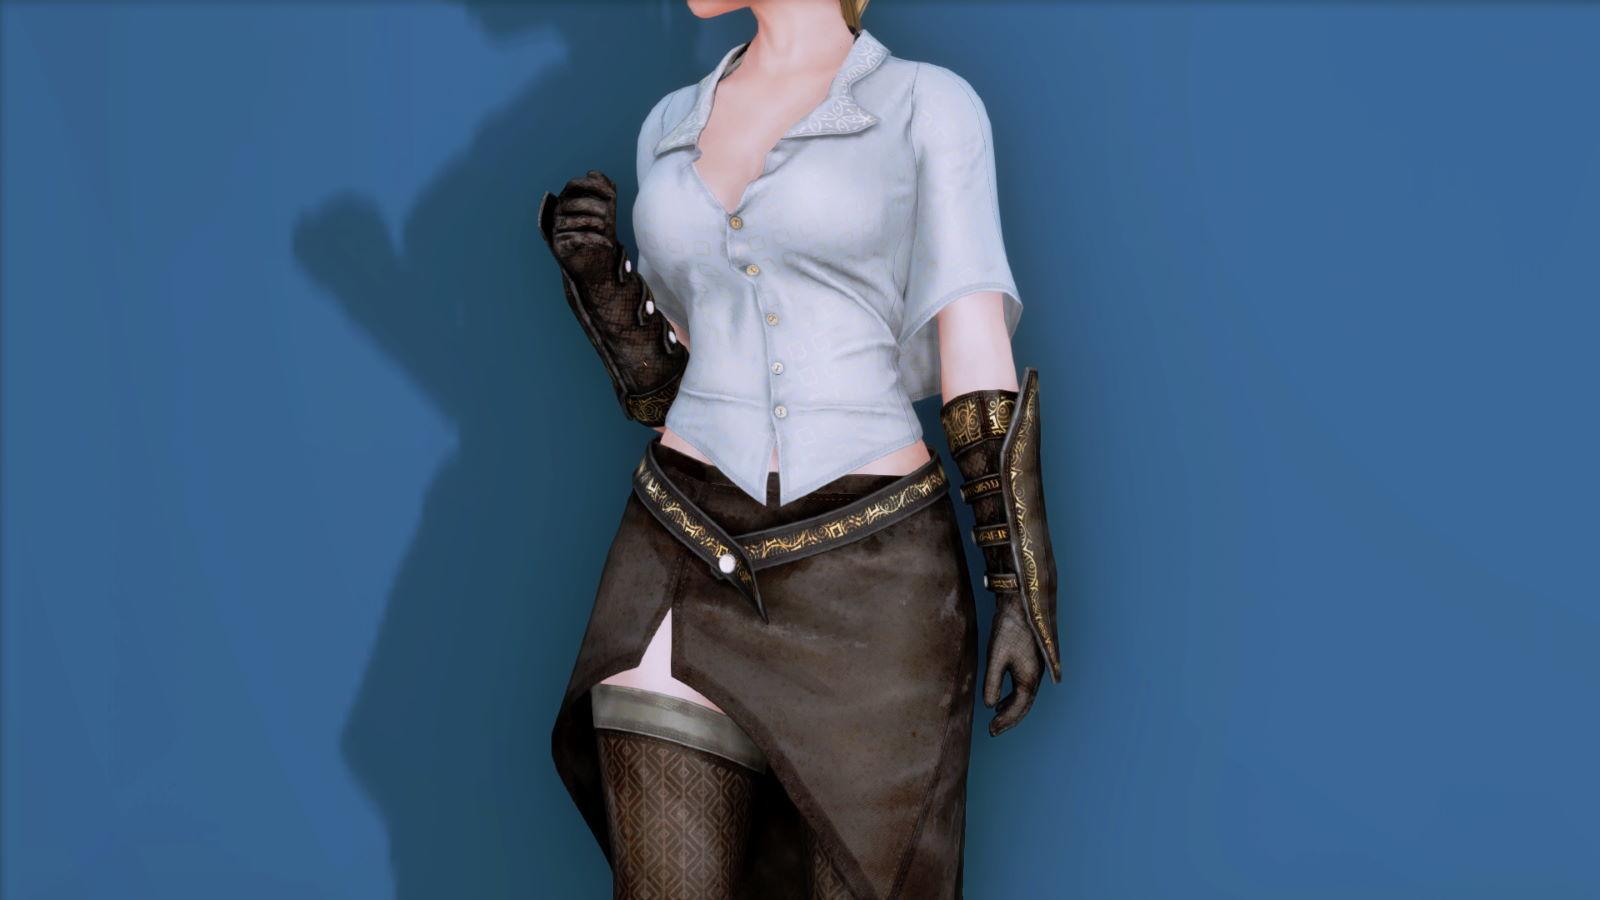 RuggedRogueSSE 112-1 Pose Up-Fr-F Blouse Skirt 1